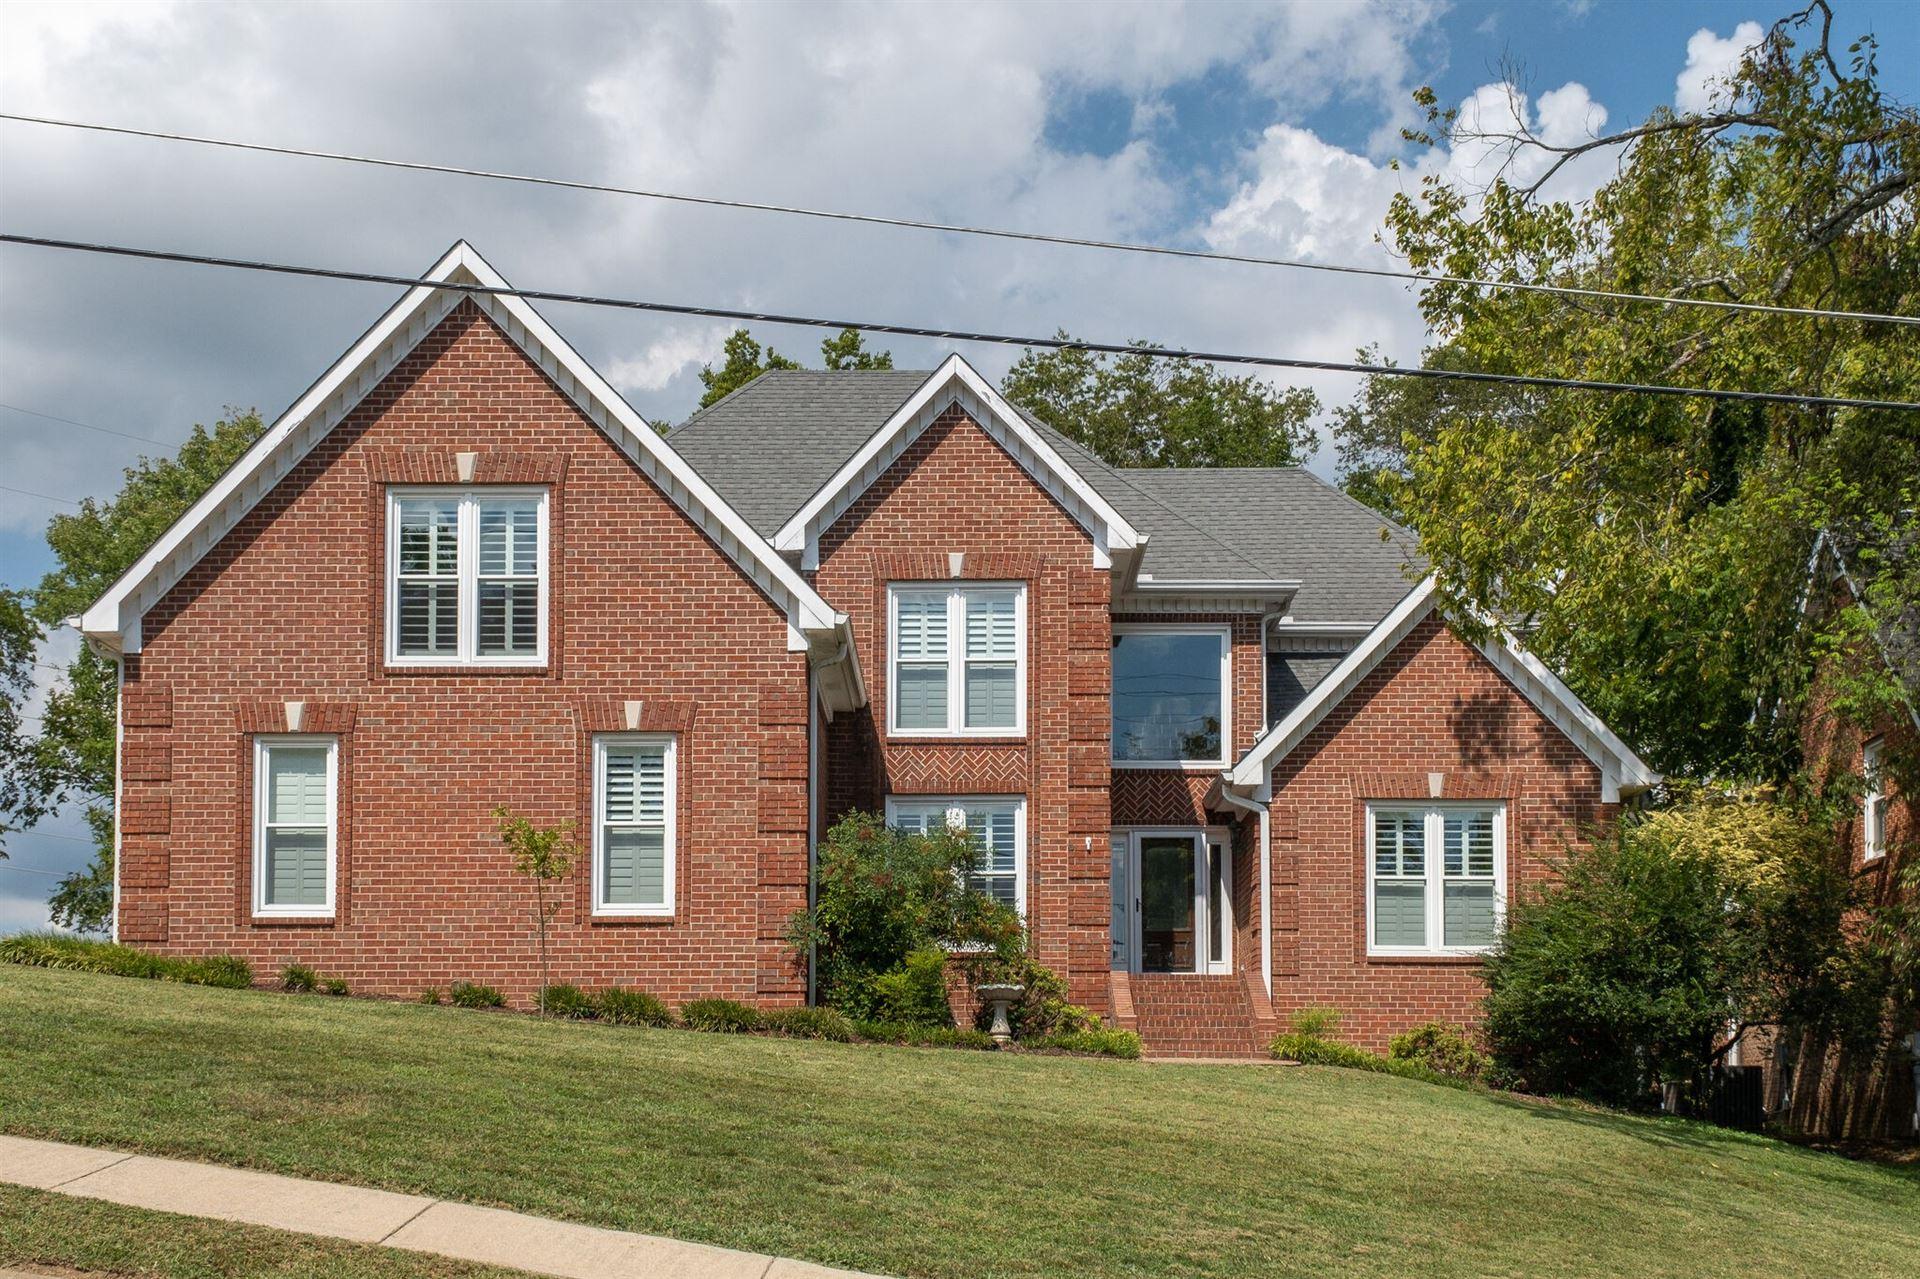 108 Country Hills Dr, Hendersonville, TN 37075 - MLS#: 2291468